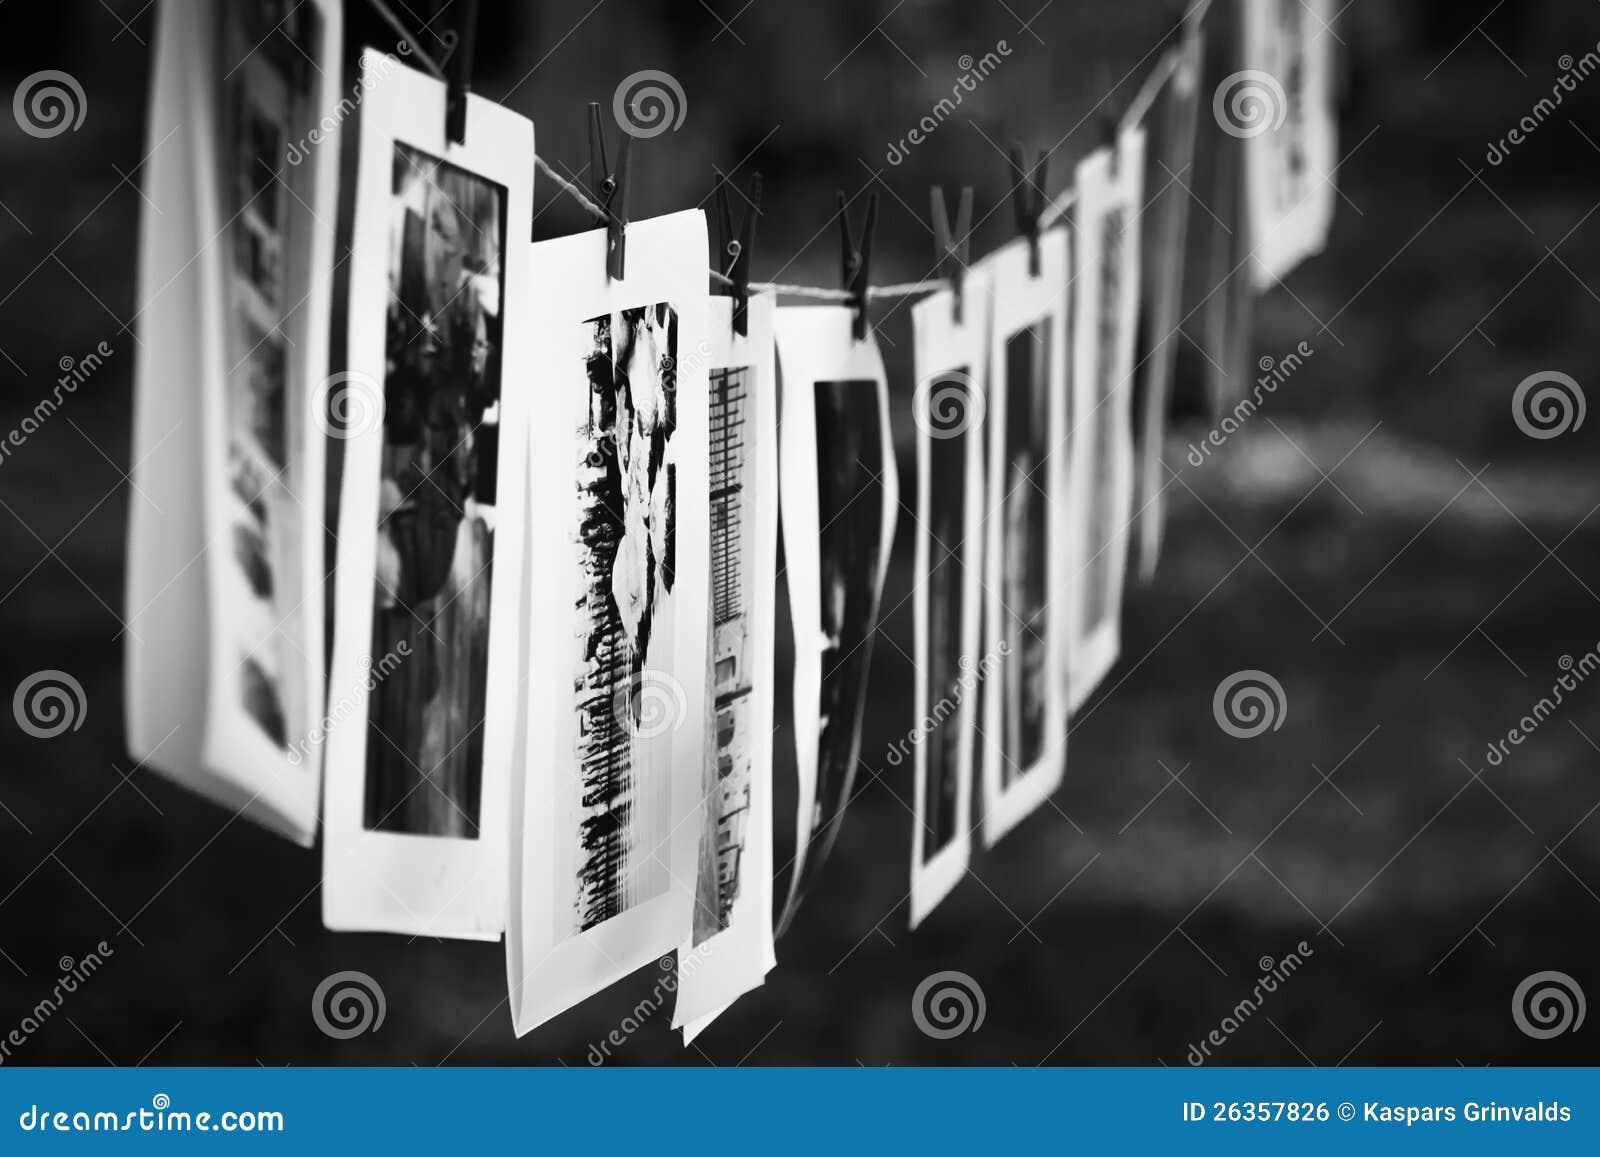 Fotografias preto e branco